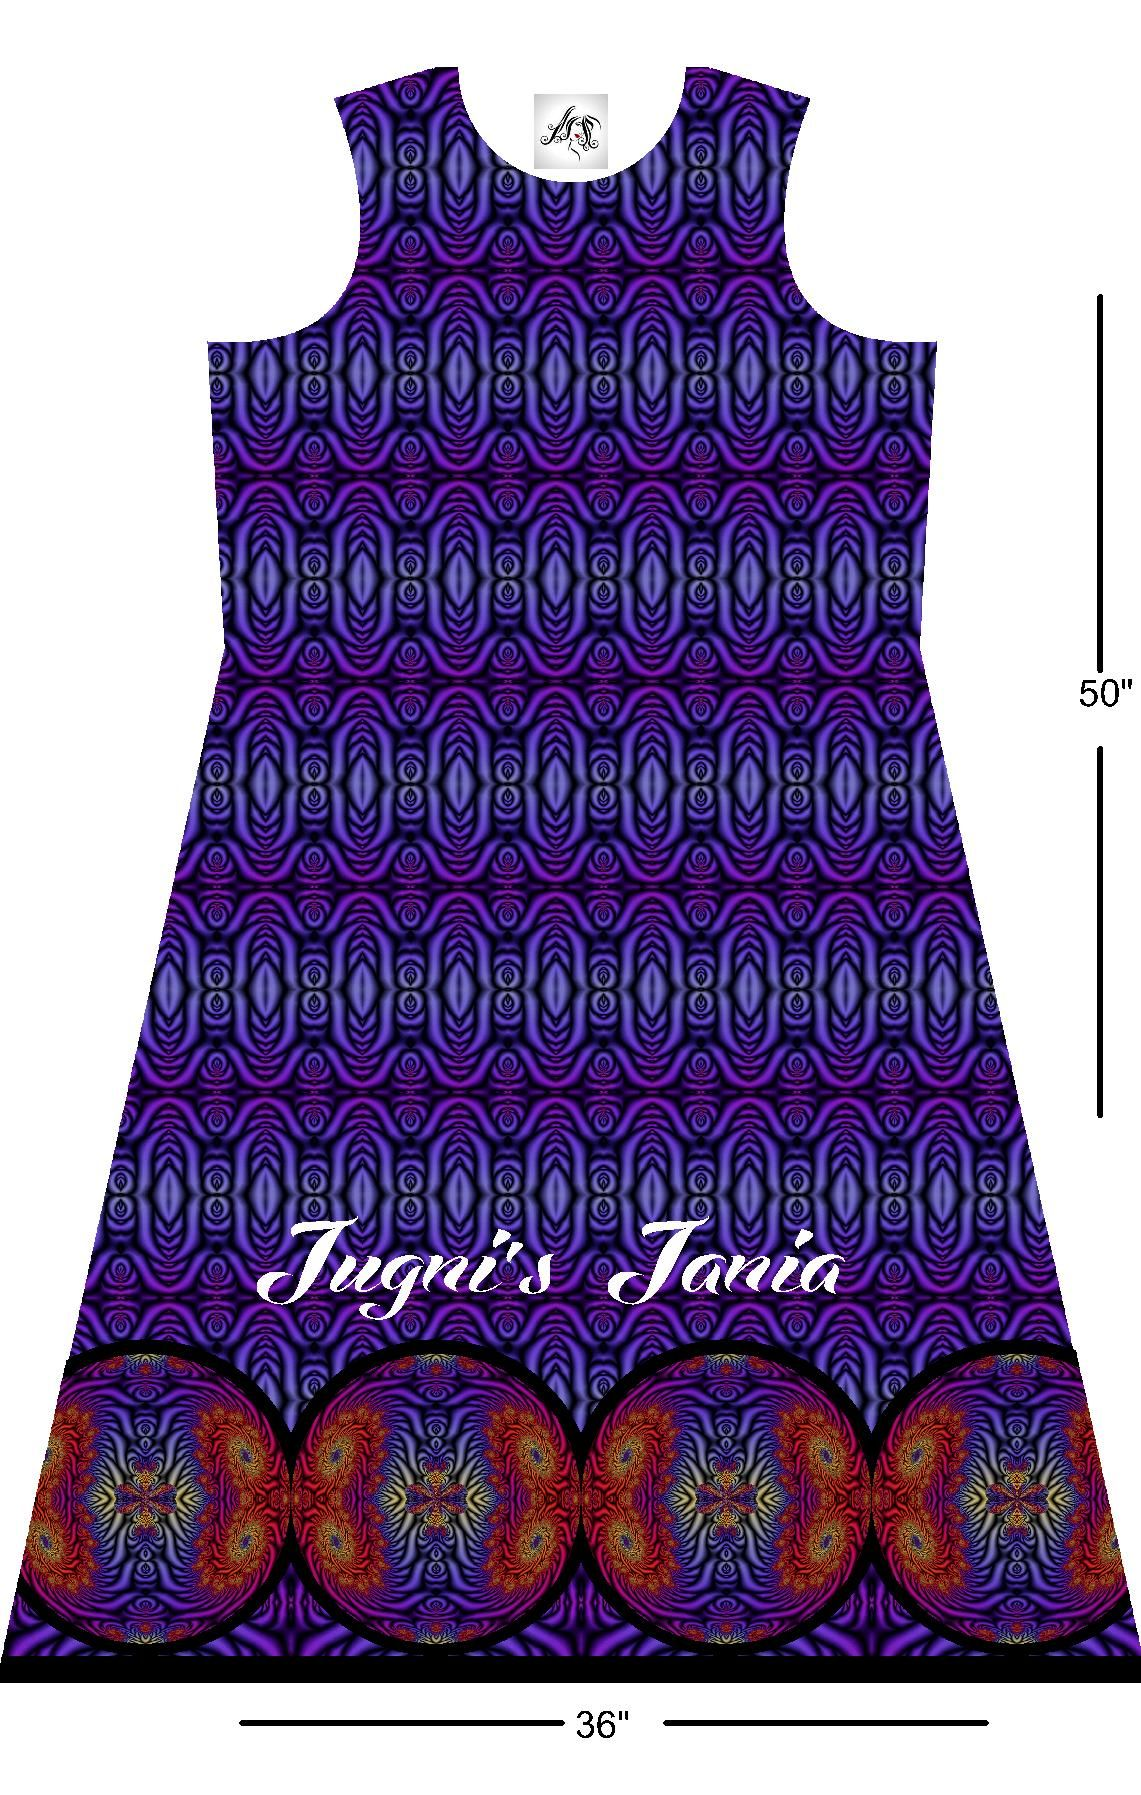 Digital print Long Shirt Front Design: Size 36x50 For